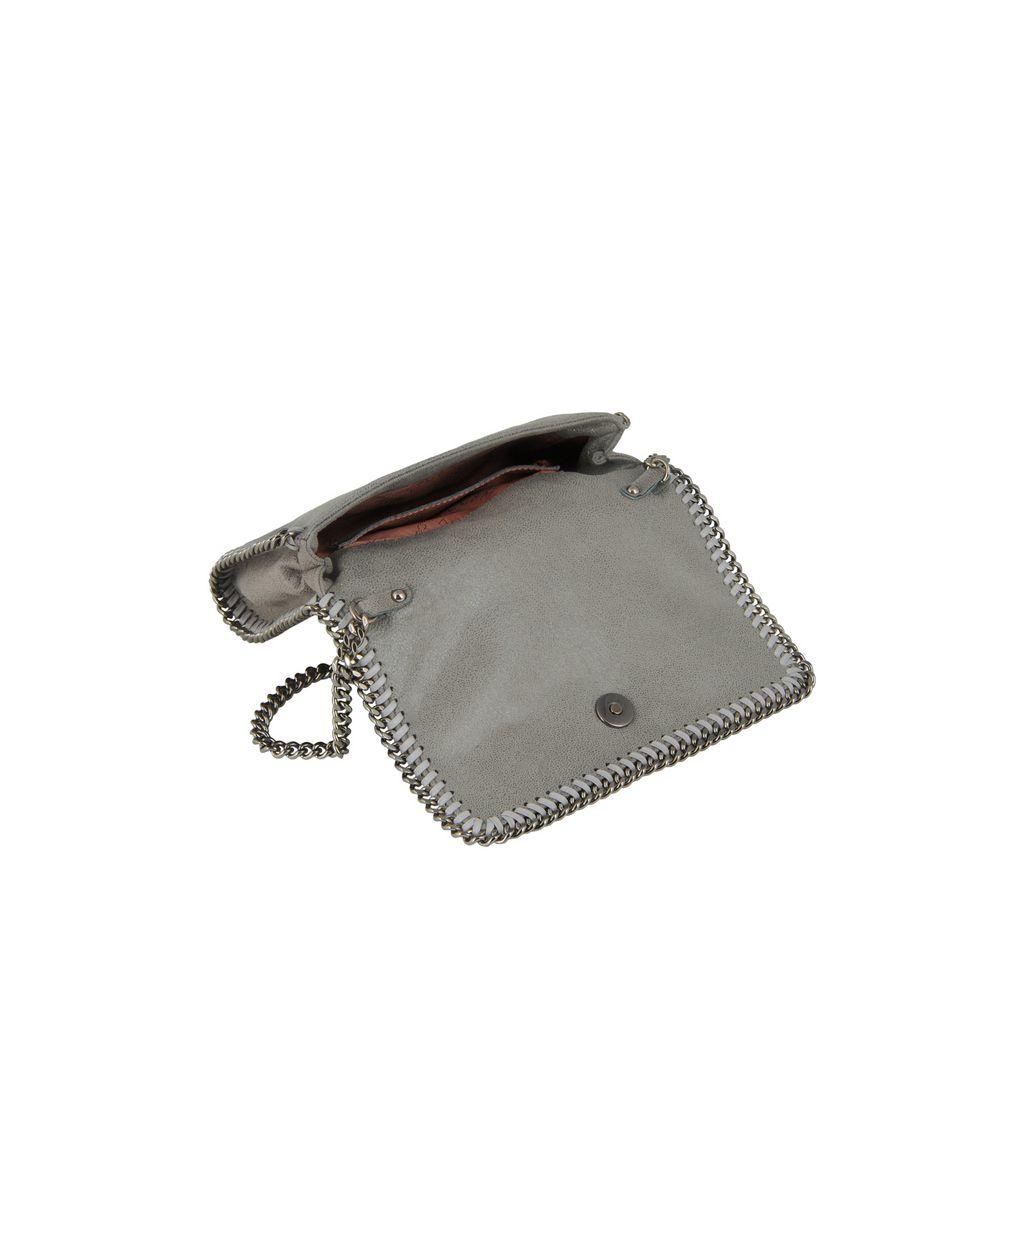 Light Grey Falabella Cross Body Bag  - STELLA MCCARTNEY